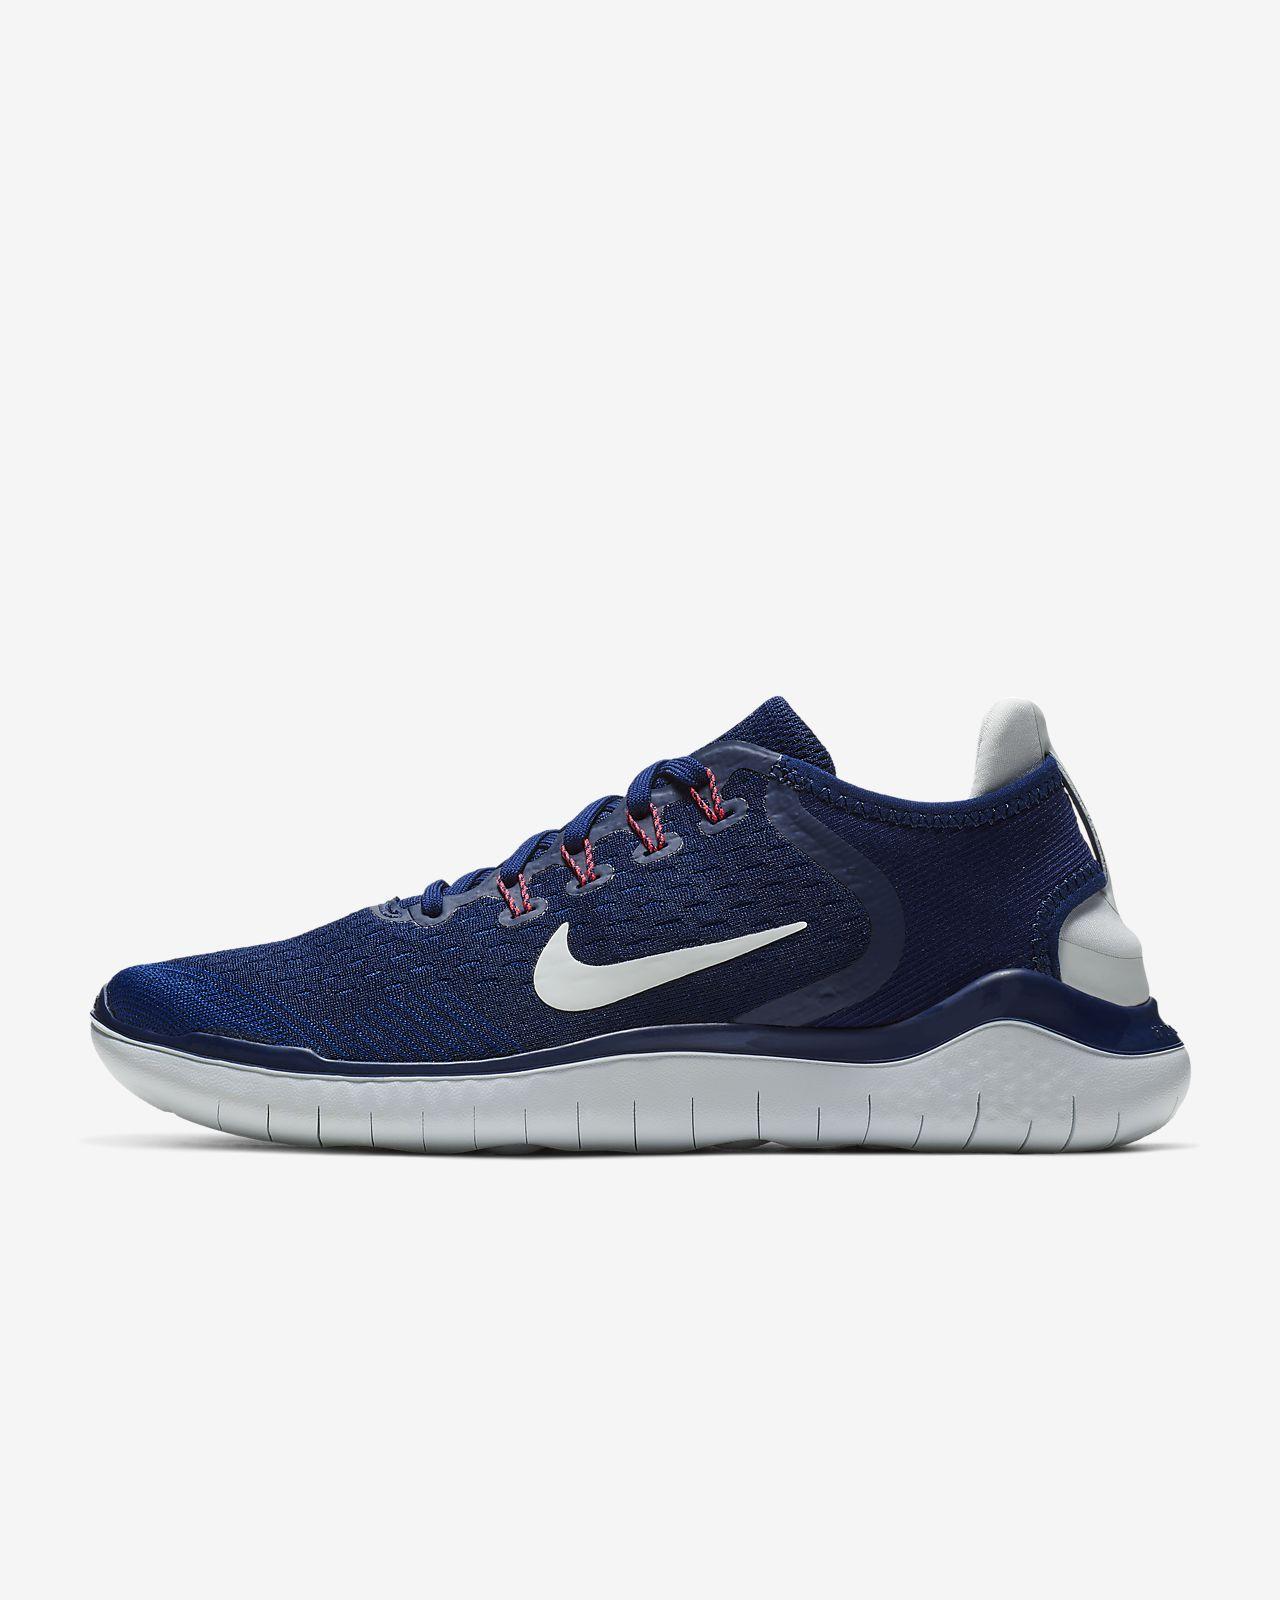 best sneakers 349ae 60598 Women s Running Shoe. Nike Free RN 2018